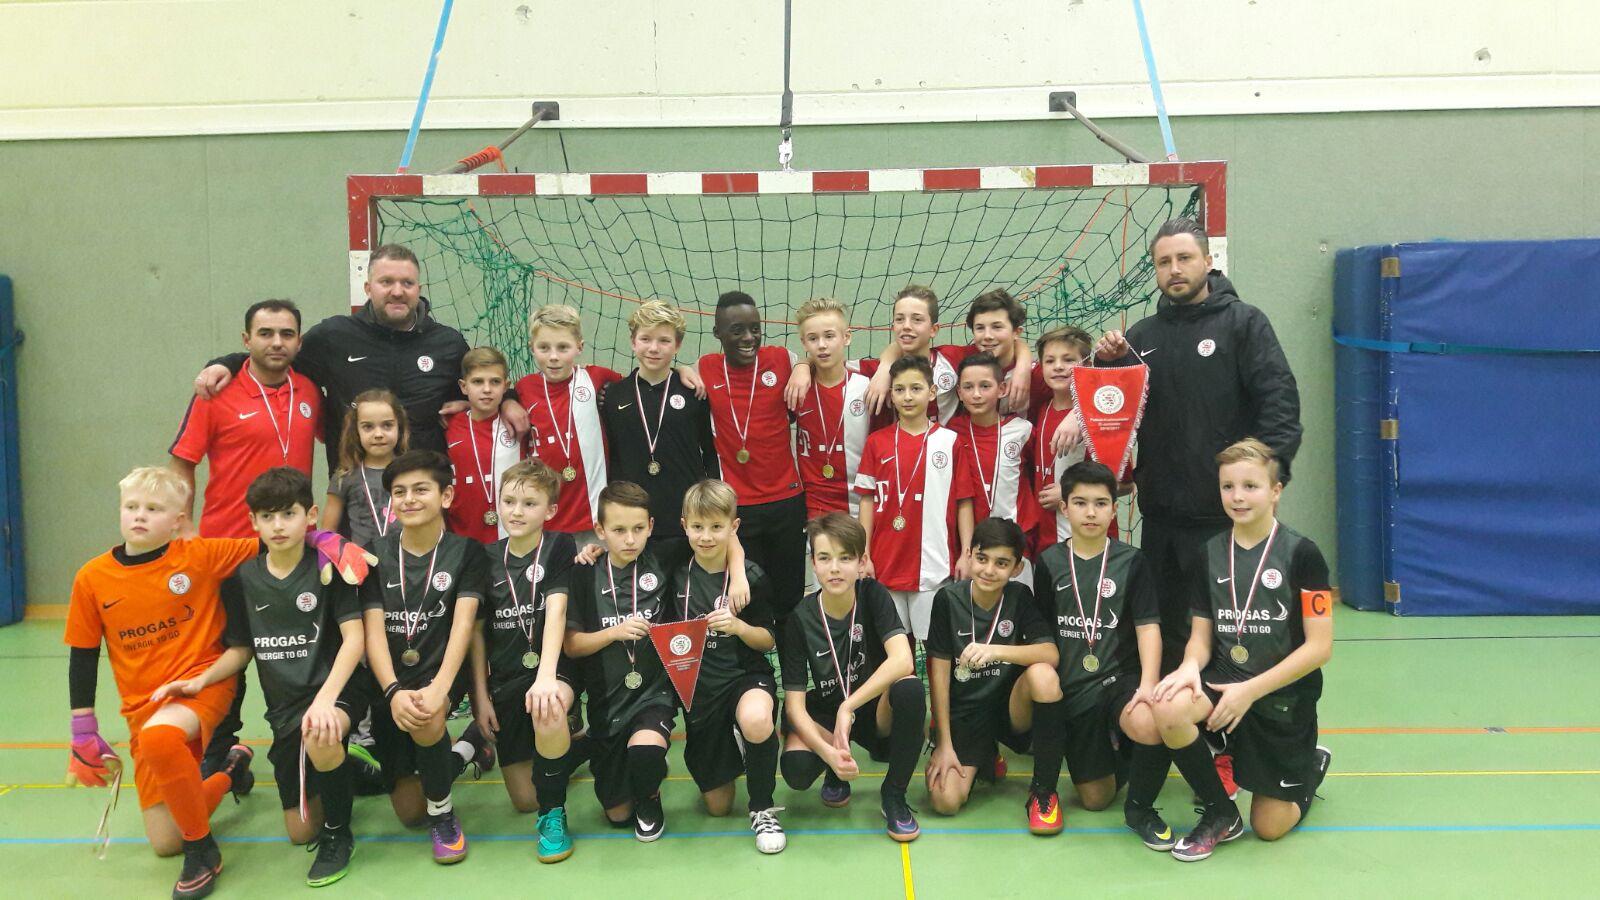 U12 Endrunde Futsal-Hallenkreismeisterschaft